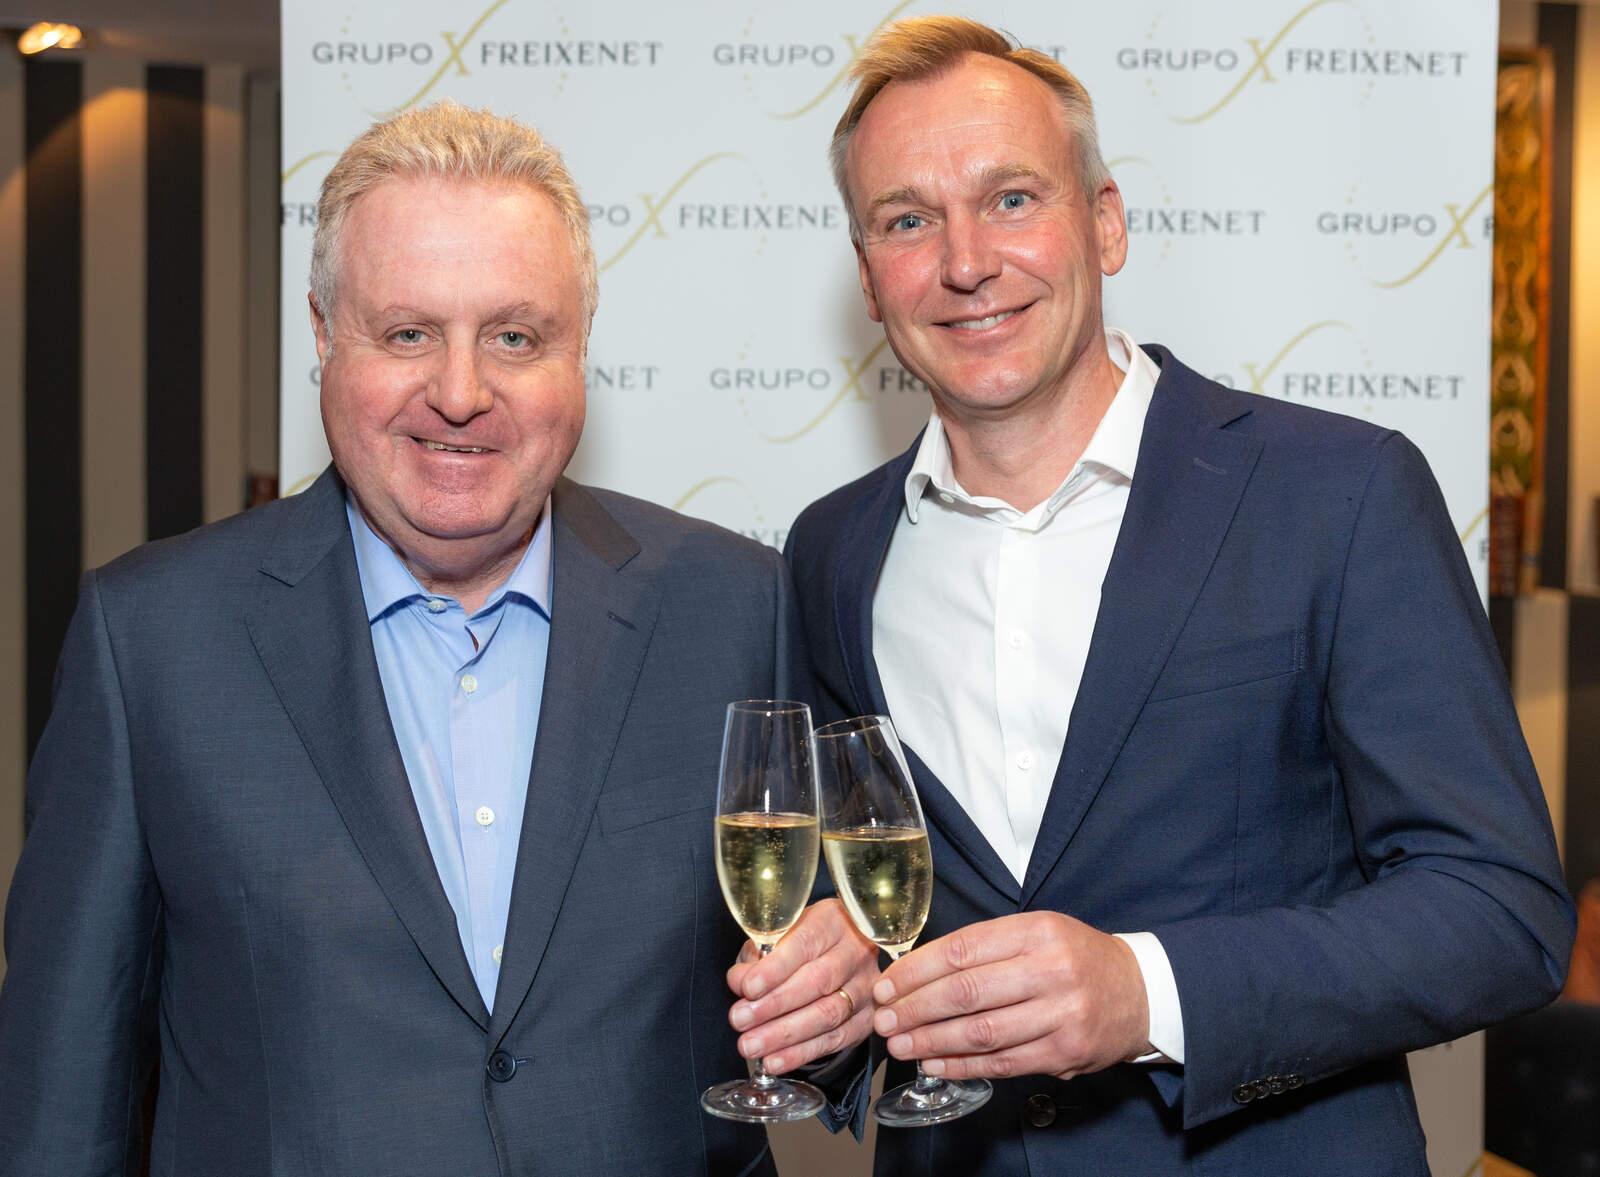 Pere Ferrer i Andreas Brokemper de Henkell Freixenet